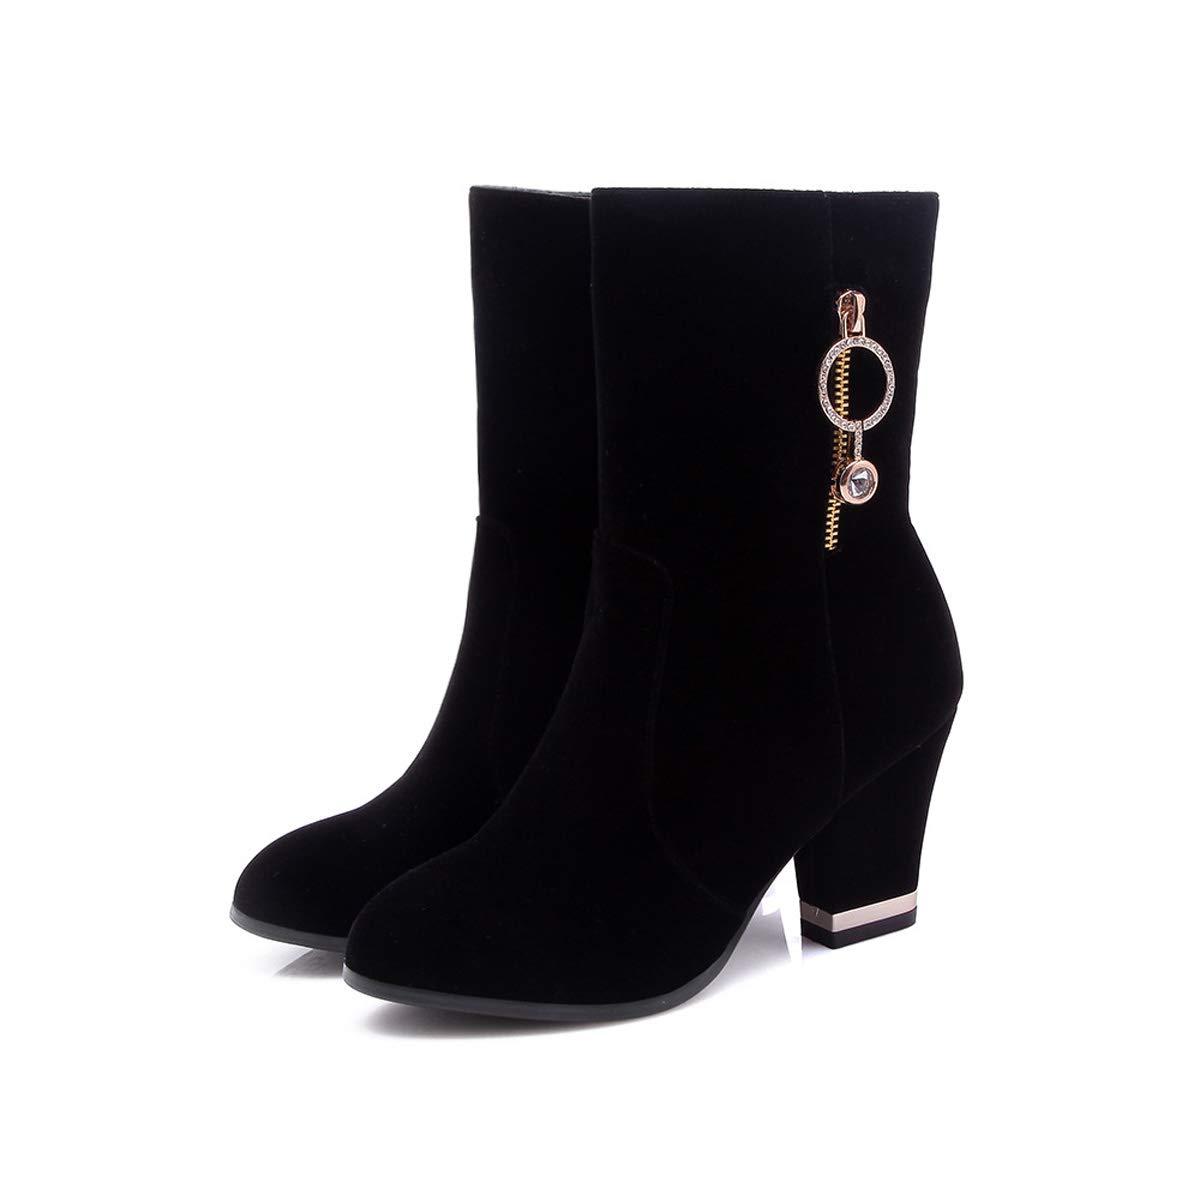 DANDANJIE damen schuhe Chunky Heel Mid-Calf Stiefel Ladies Fall Winter Warm Ankle Stiefel Schuhe schwarz